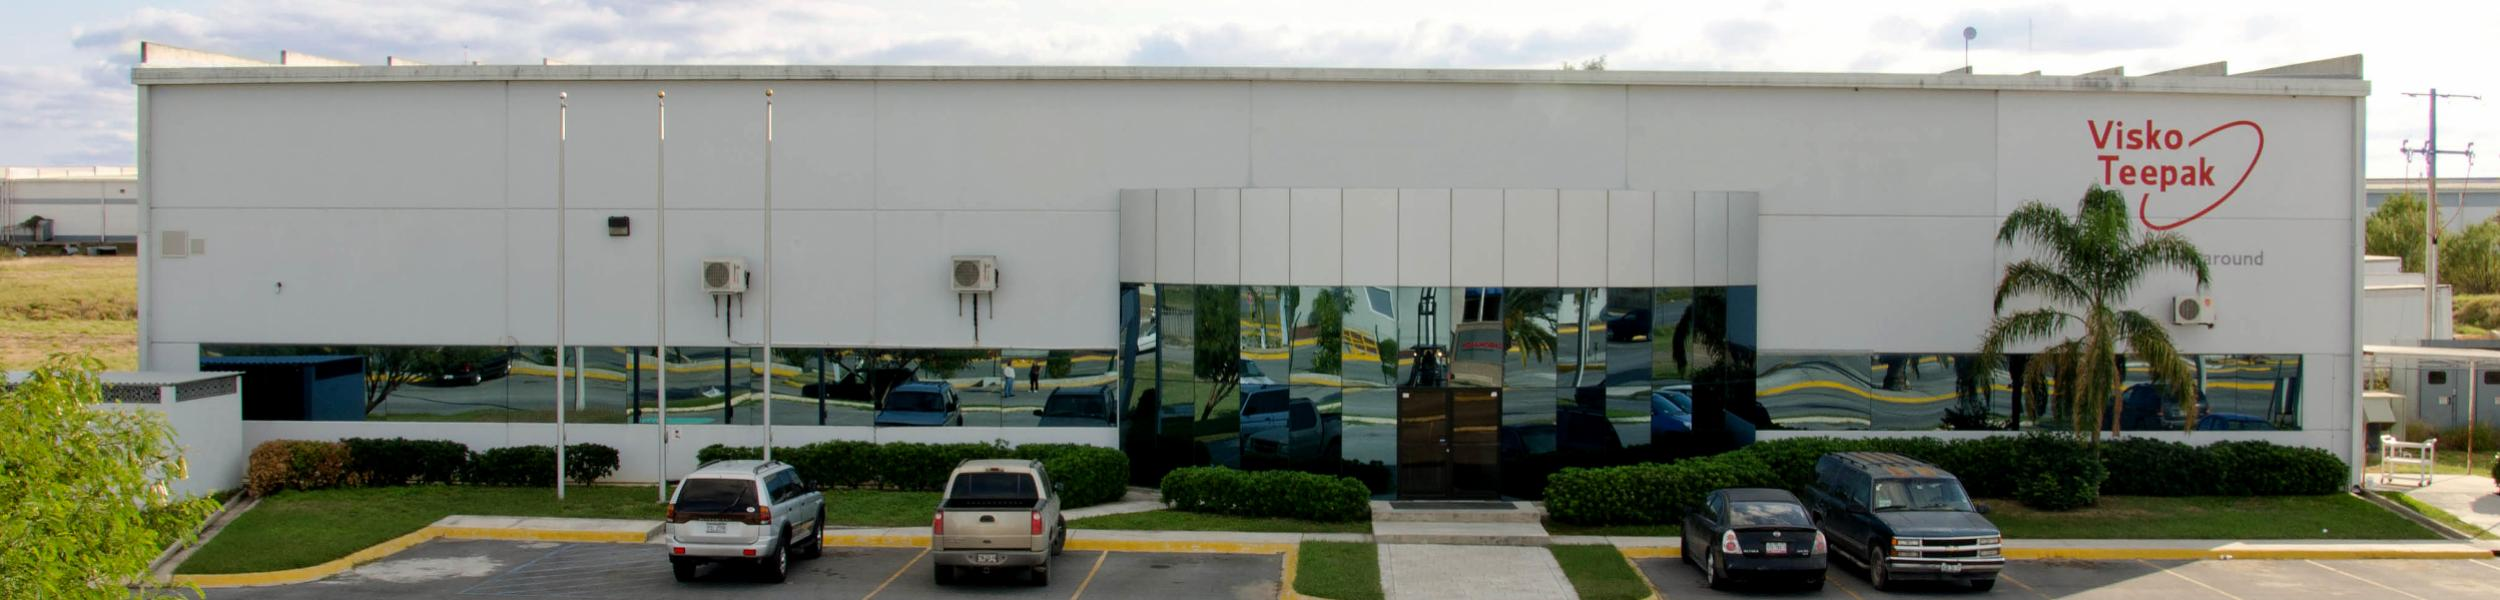 ViskoTeepak plastic prodcutions plant, Nuevo Laredo